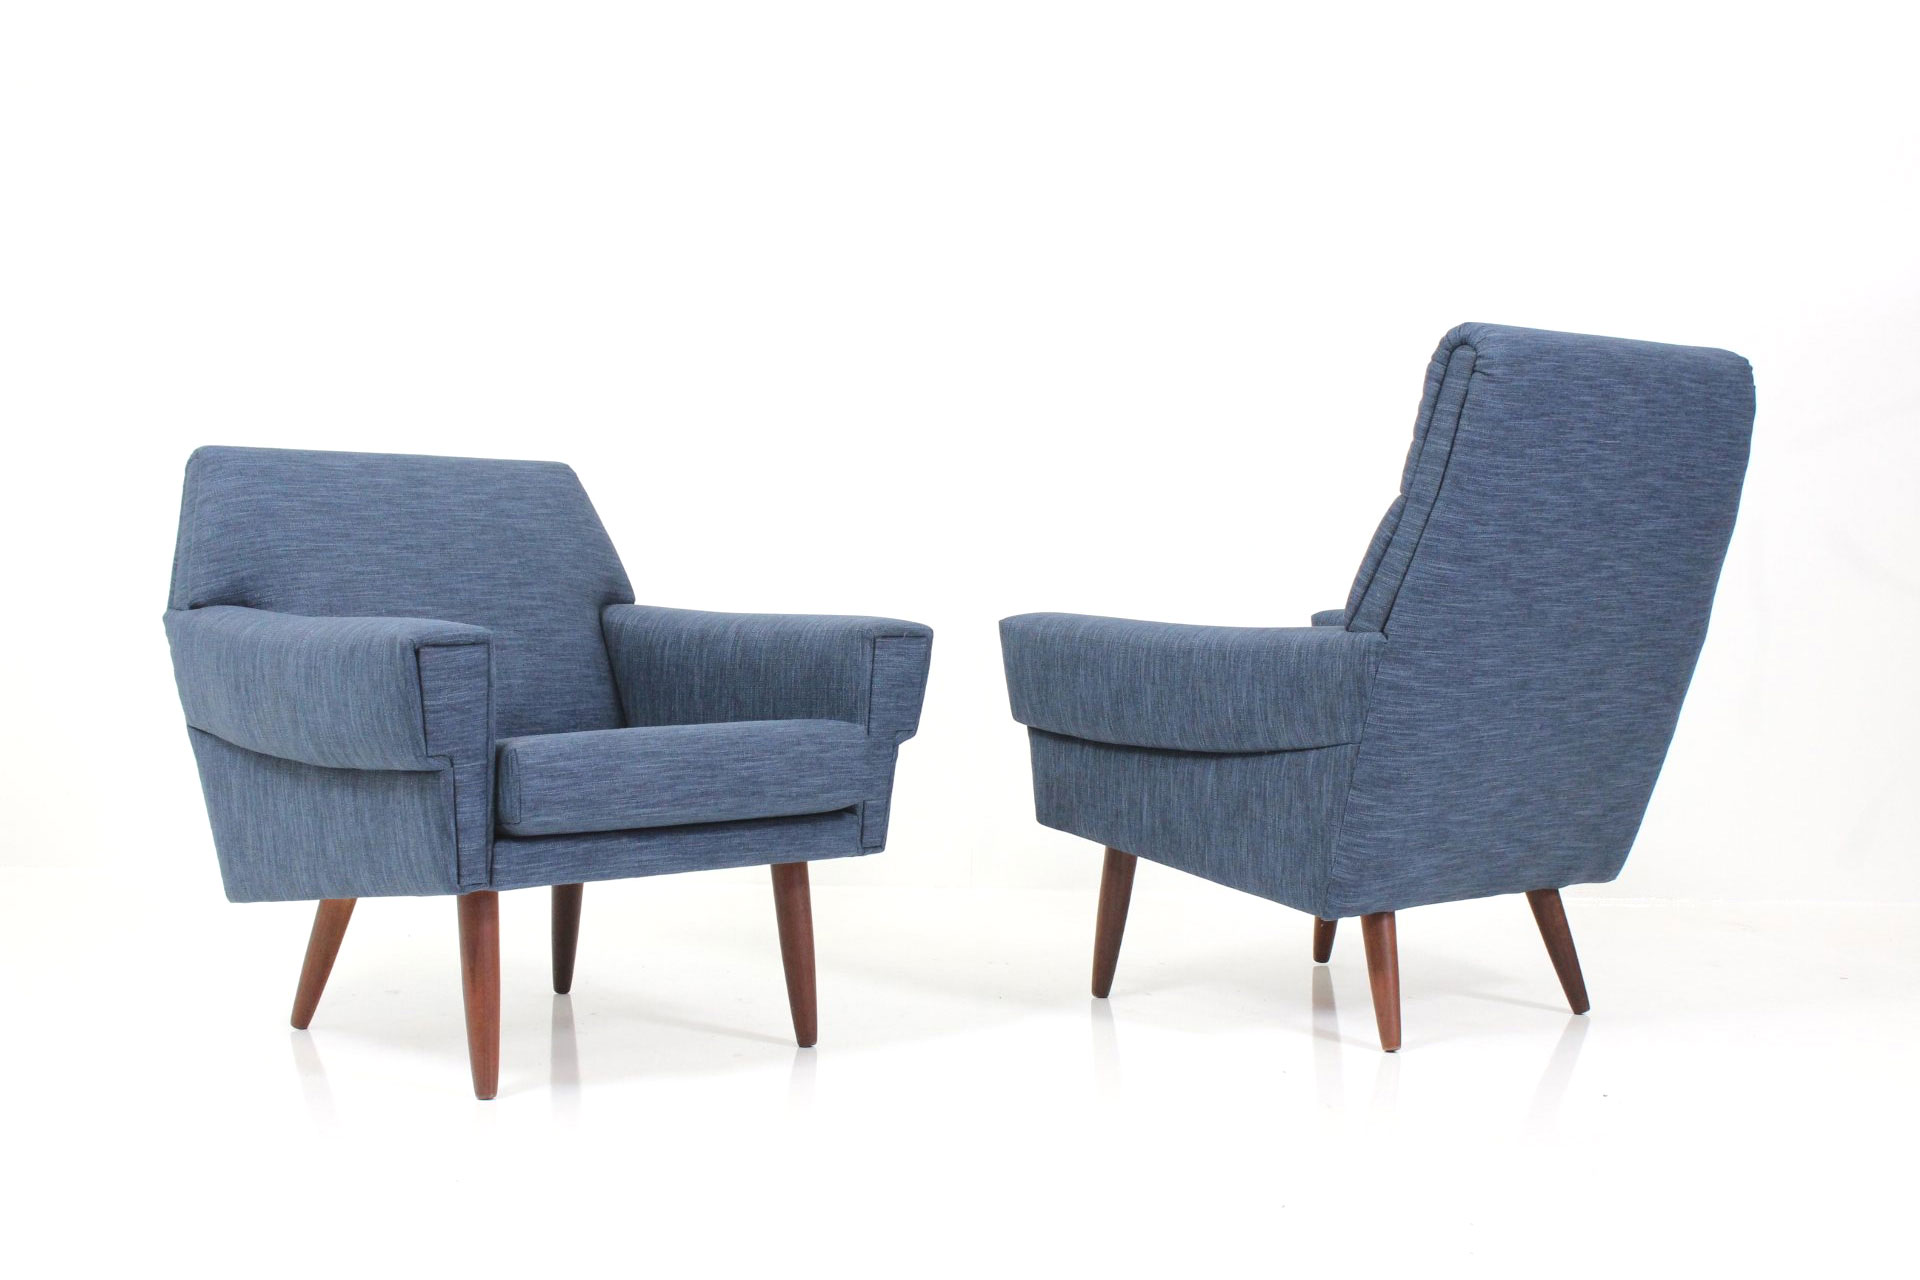 Asymmetric Armchairs by Georg Thams DAVINT Design